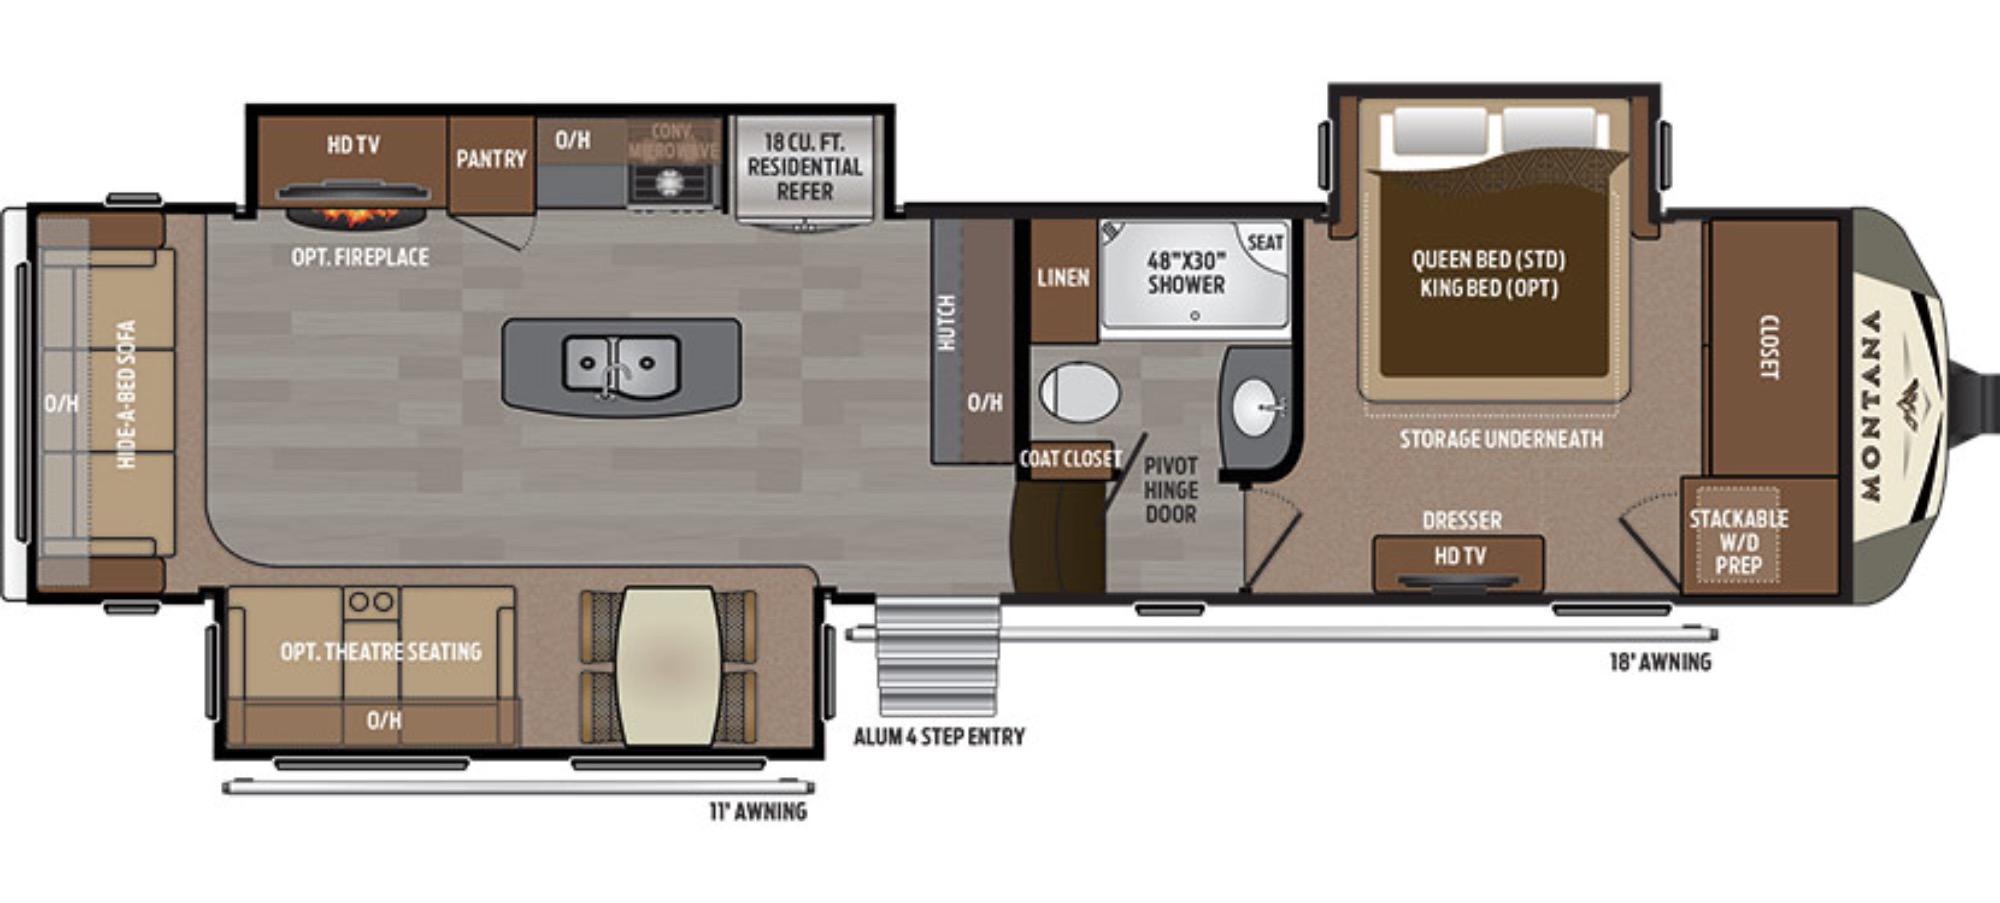 View Floor Plan for 2017 KEYSTONE MONTANA 3611RL